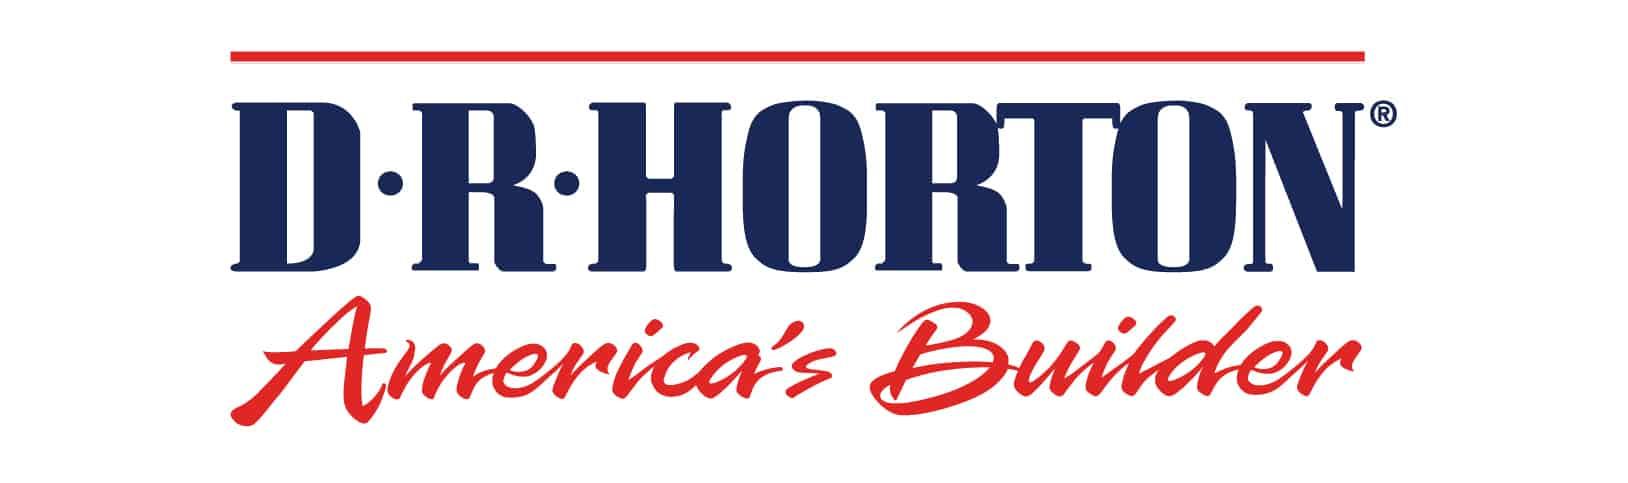 WC_DRHorton_Logo